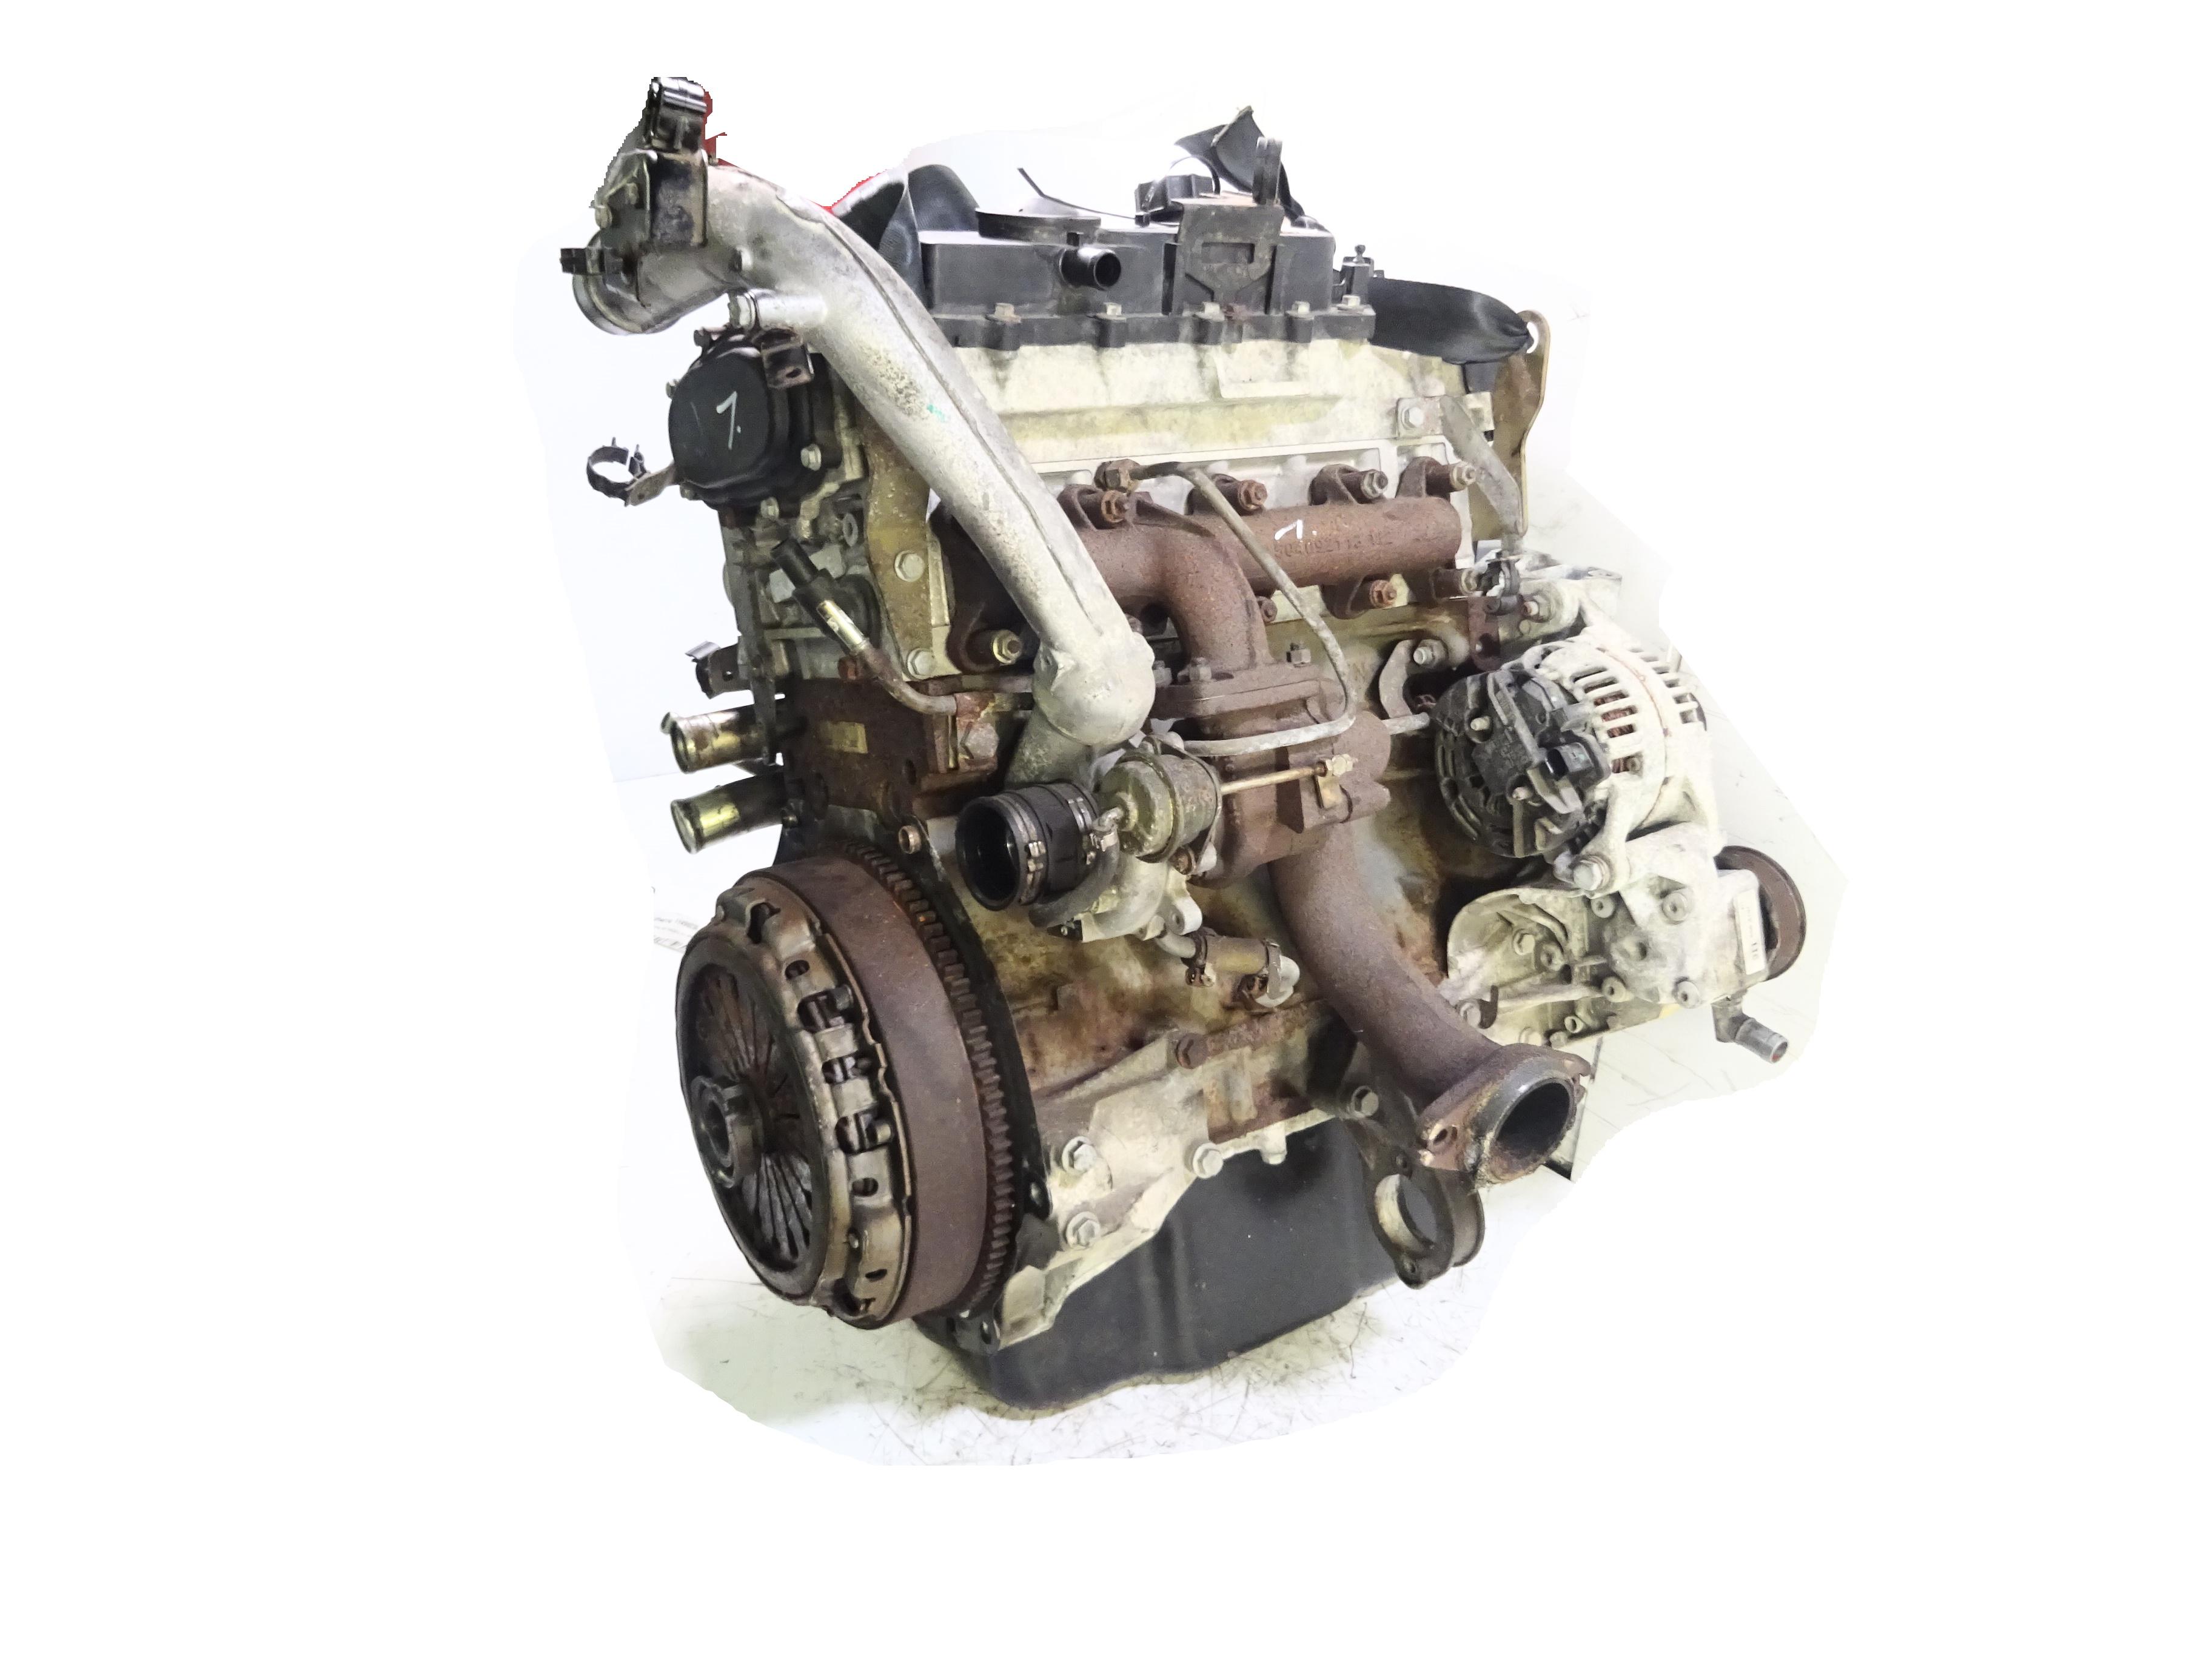 Motor 2006 für Fiat Ducato 244 2,3 JTD Diesel F1AE0481C F1AE 110 PS